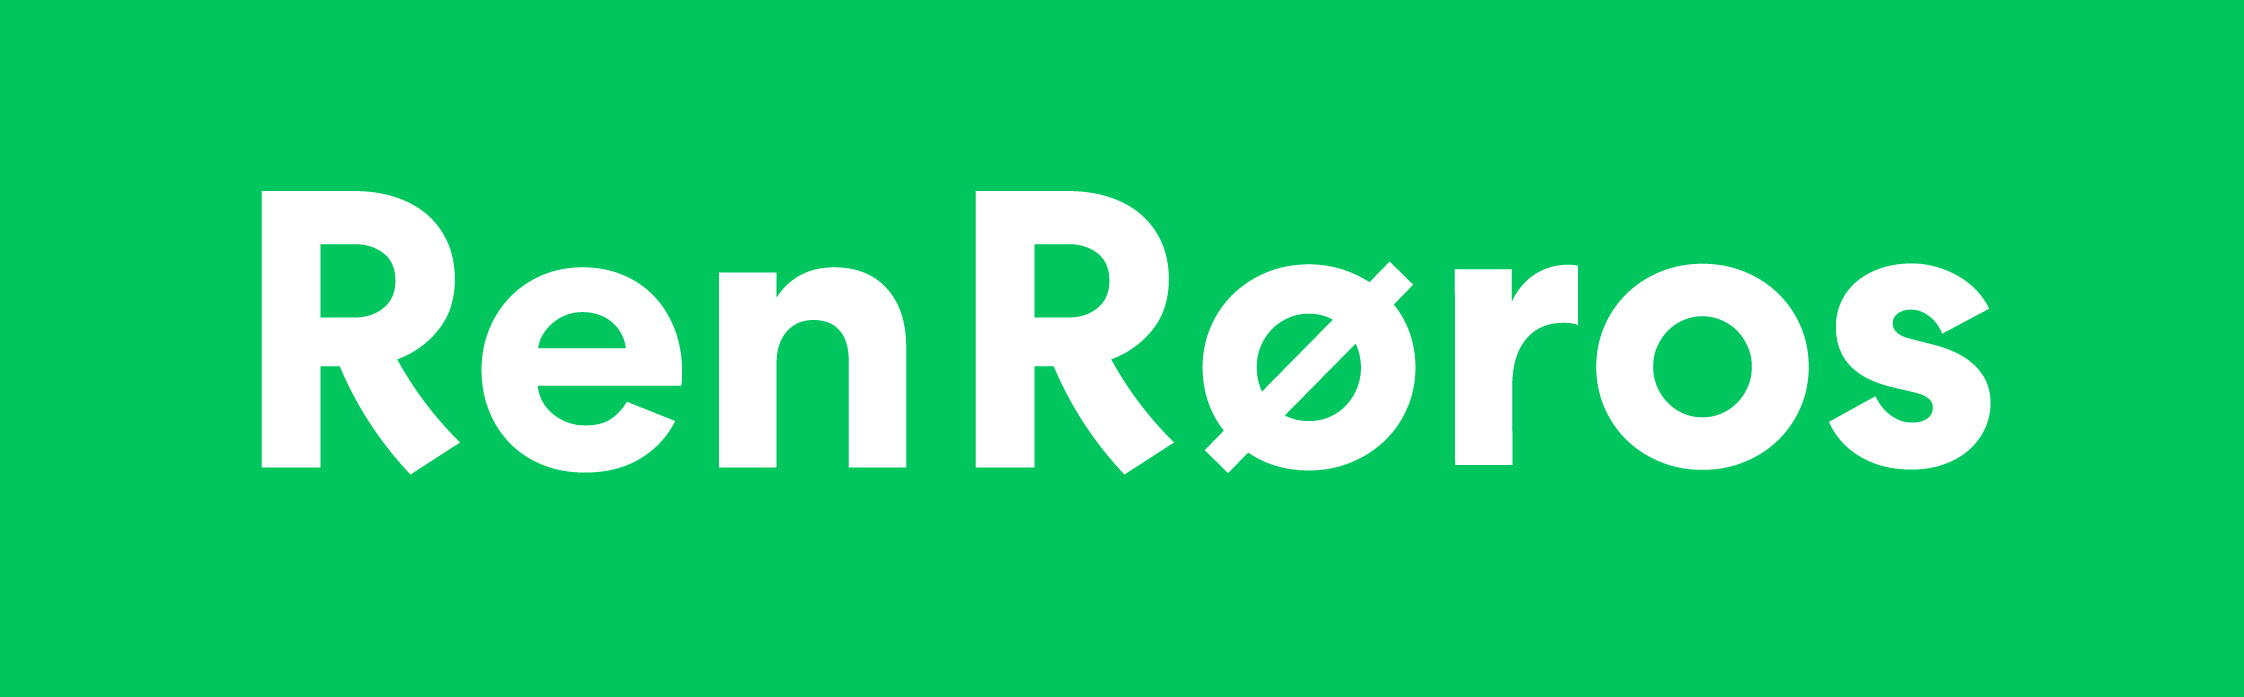 Ren_Røros_RGB